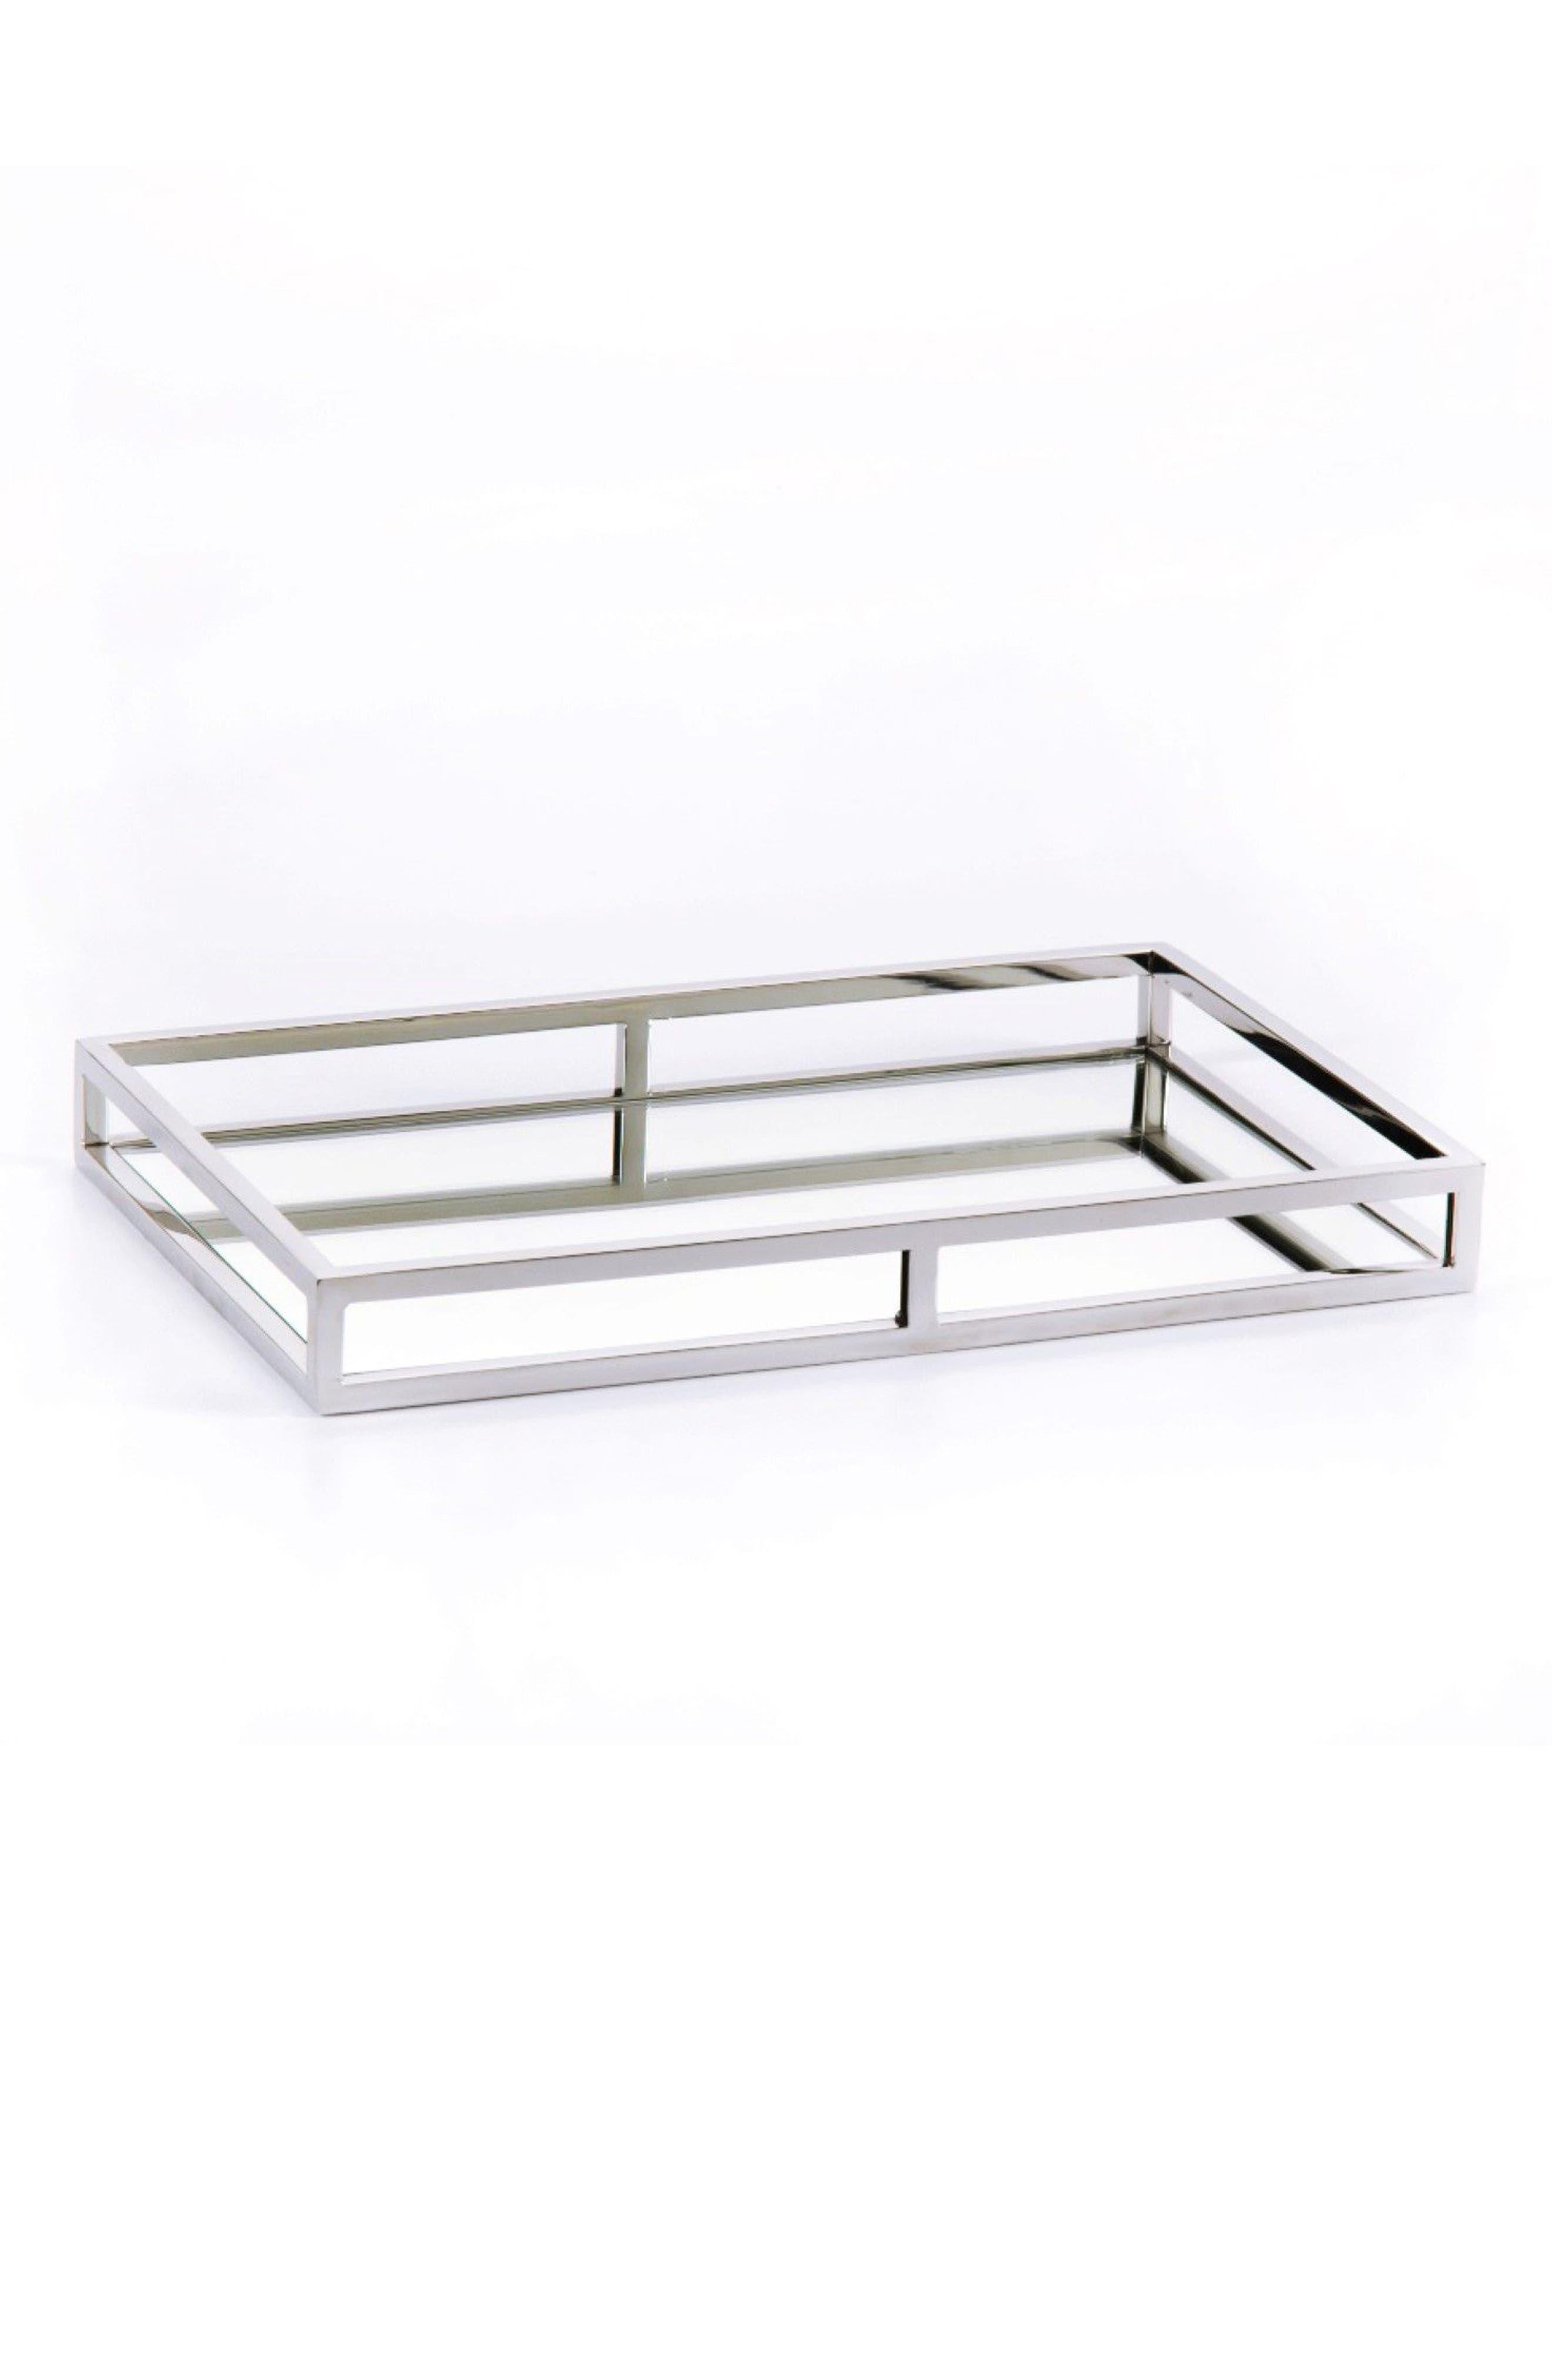 Venturi Rectangular Mirrored Tray,                             Main thumbnail 1, color,                             Silver